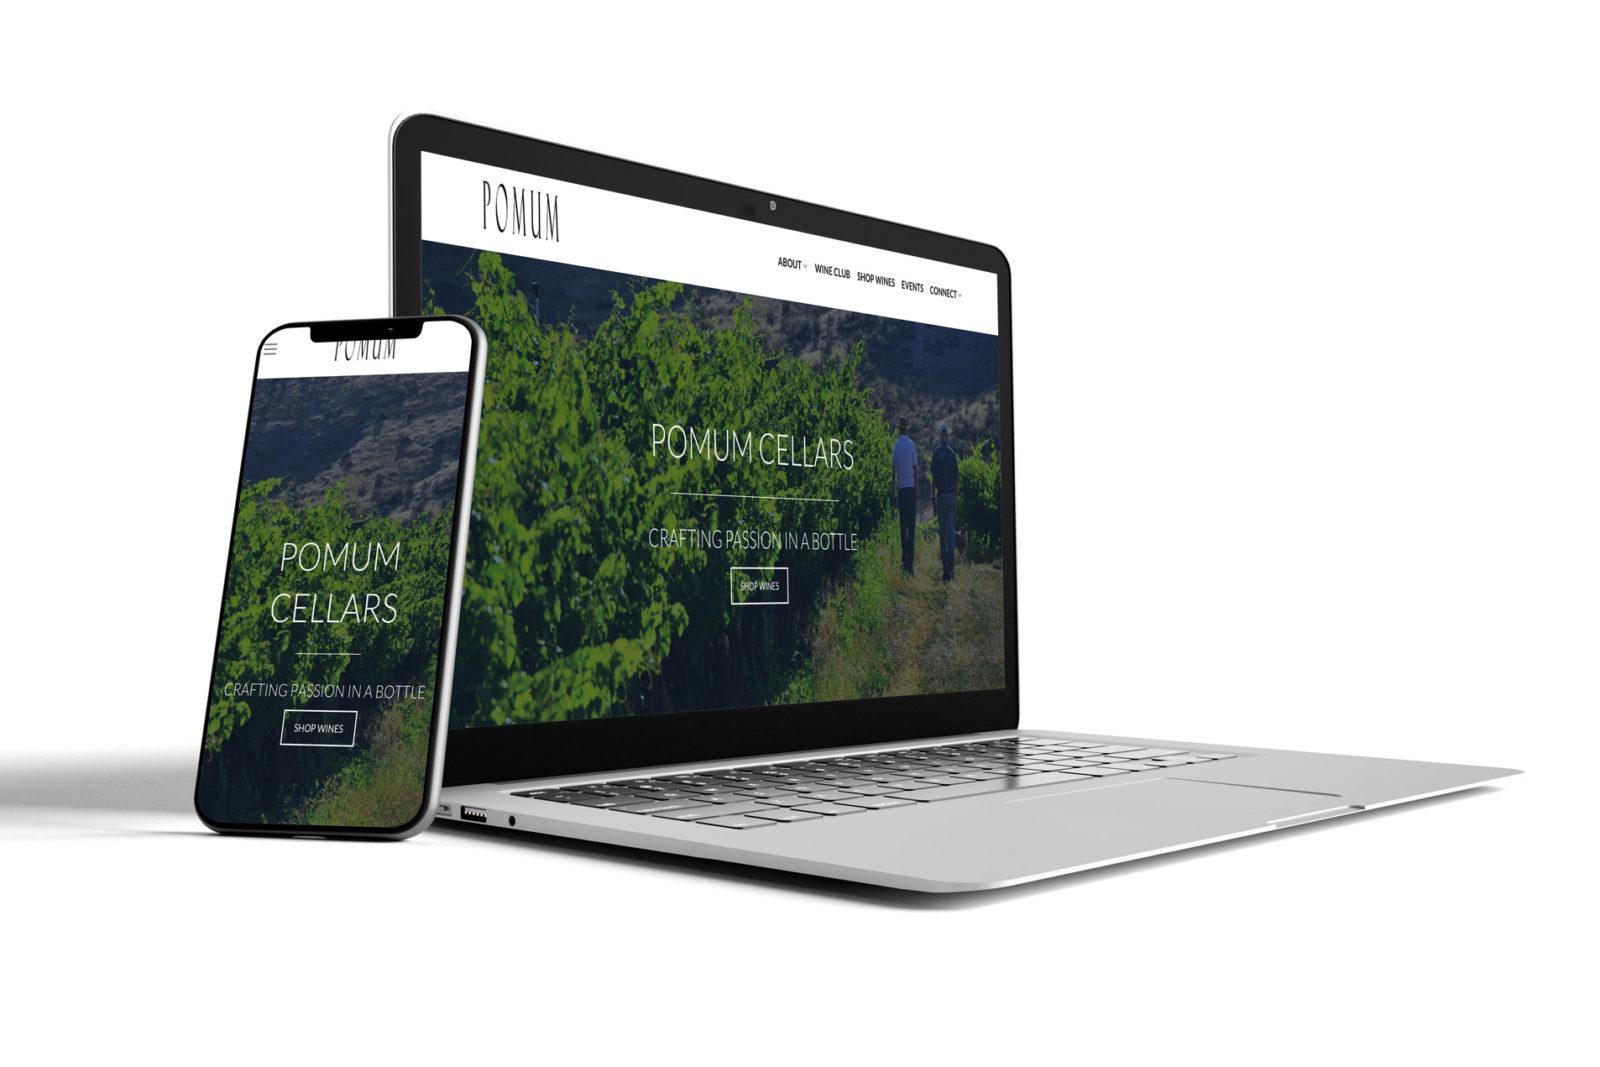 pomum cellars website